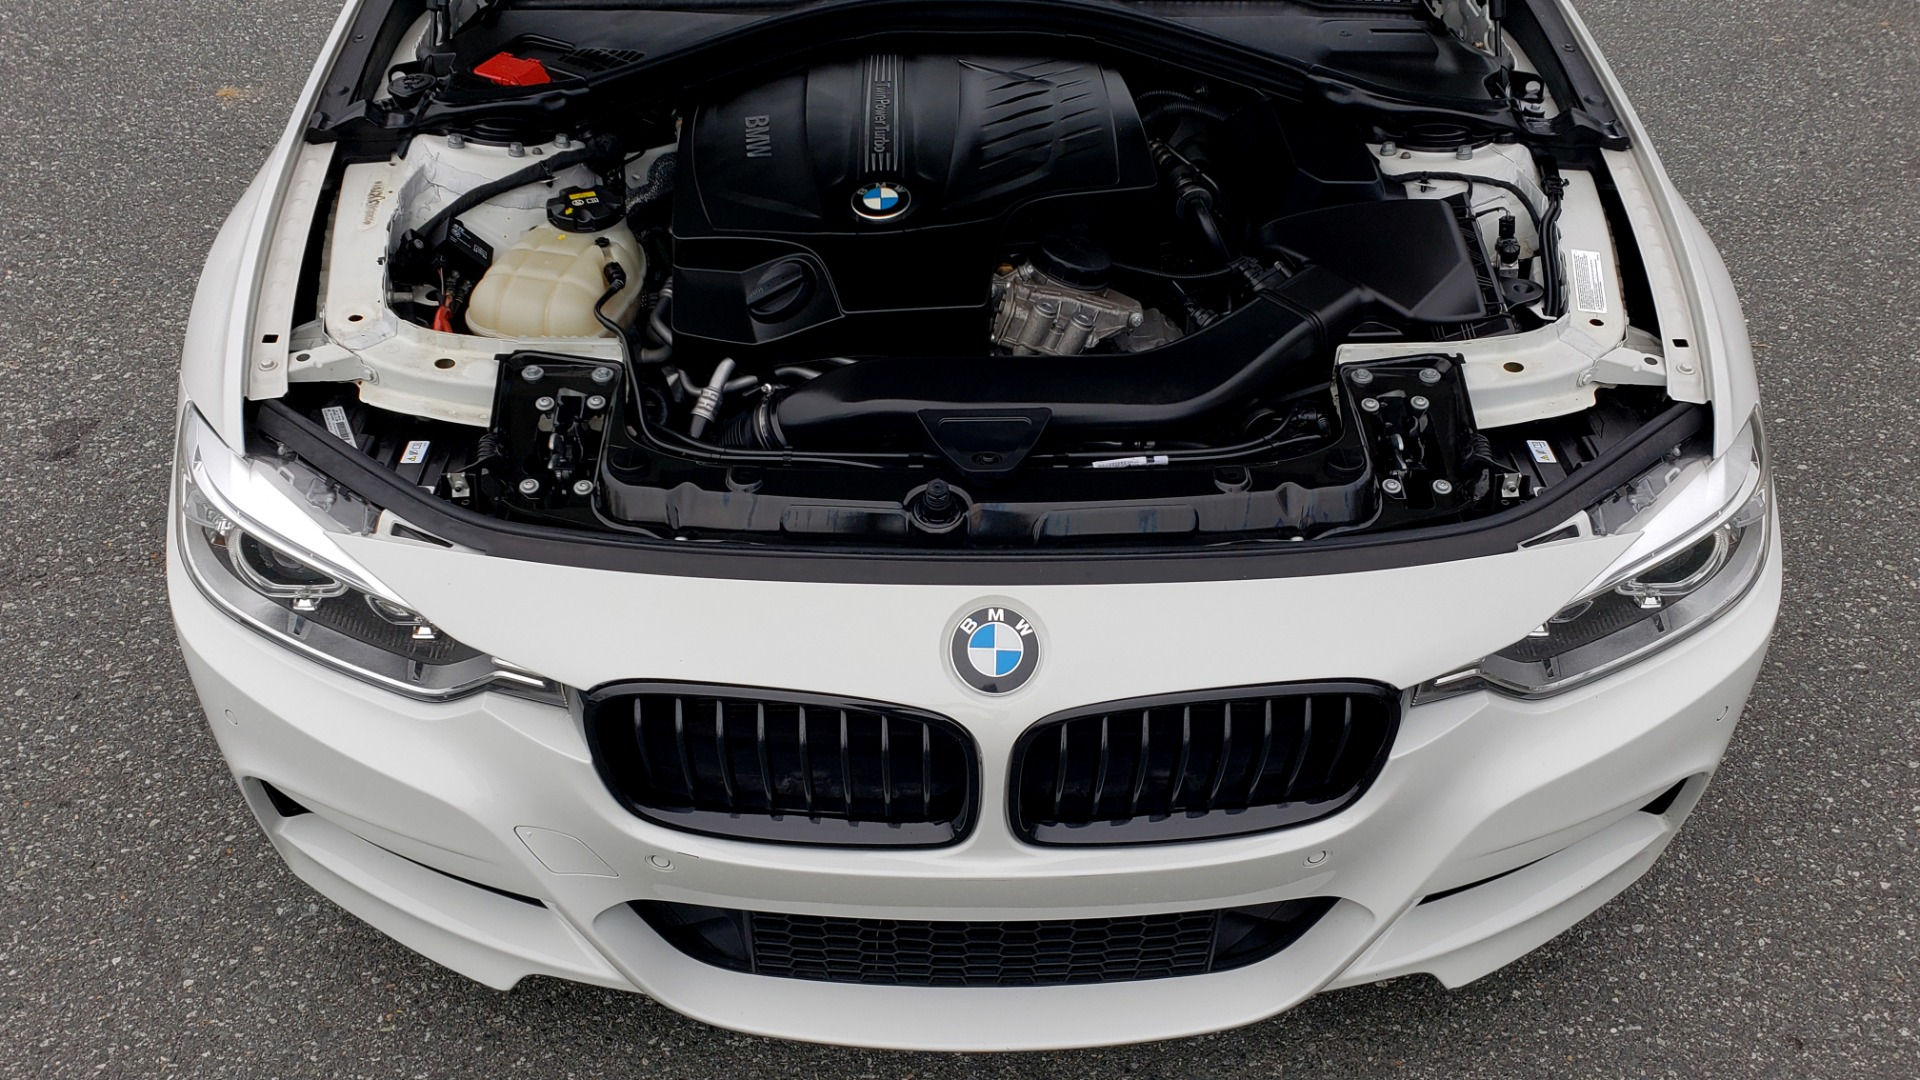 Used 2015 BMW 3 Series 335I M-SPORT / PREM PKG / HK SND / SUNROOF / REARVIEW for sale Sold at Formula Imports in Charlotte NC 28227 11